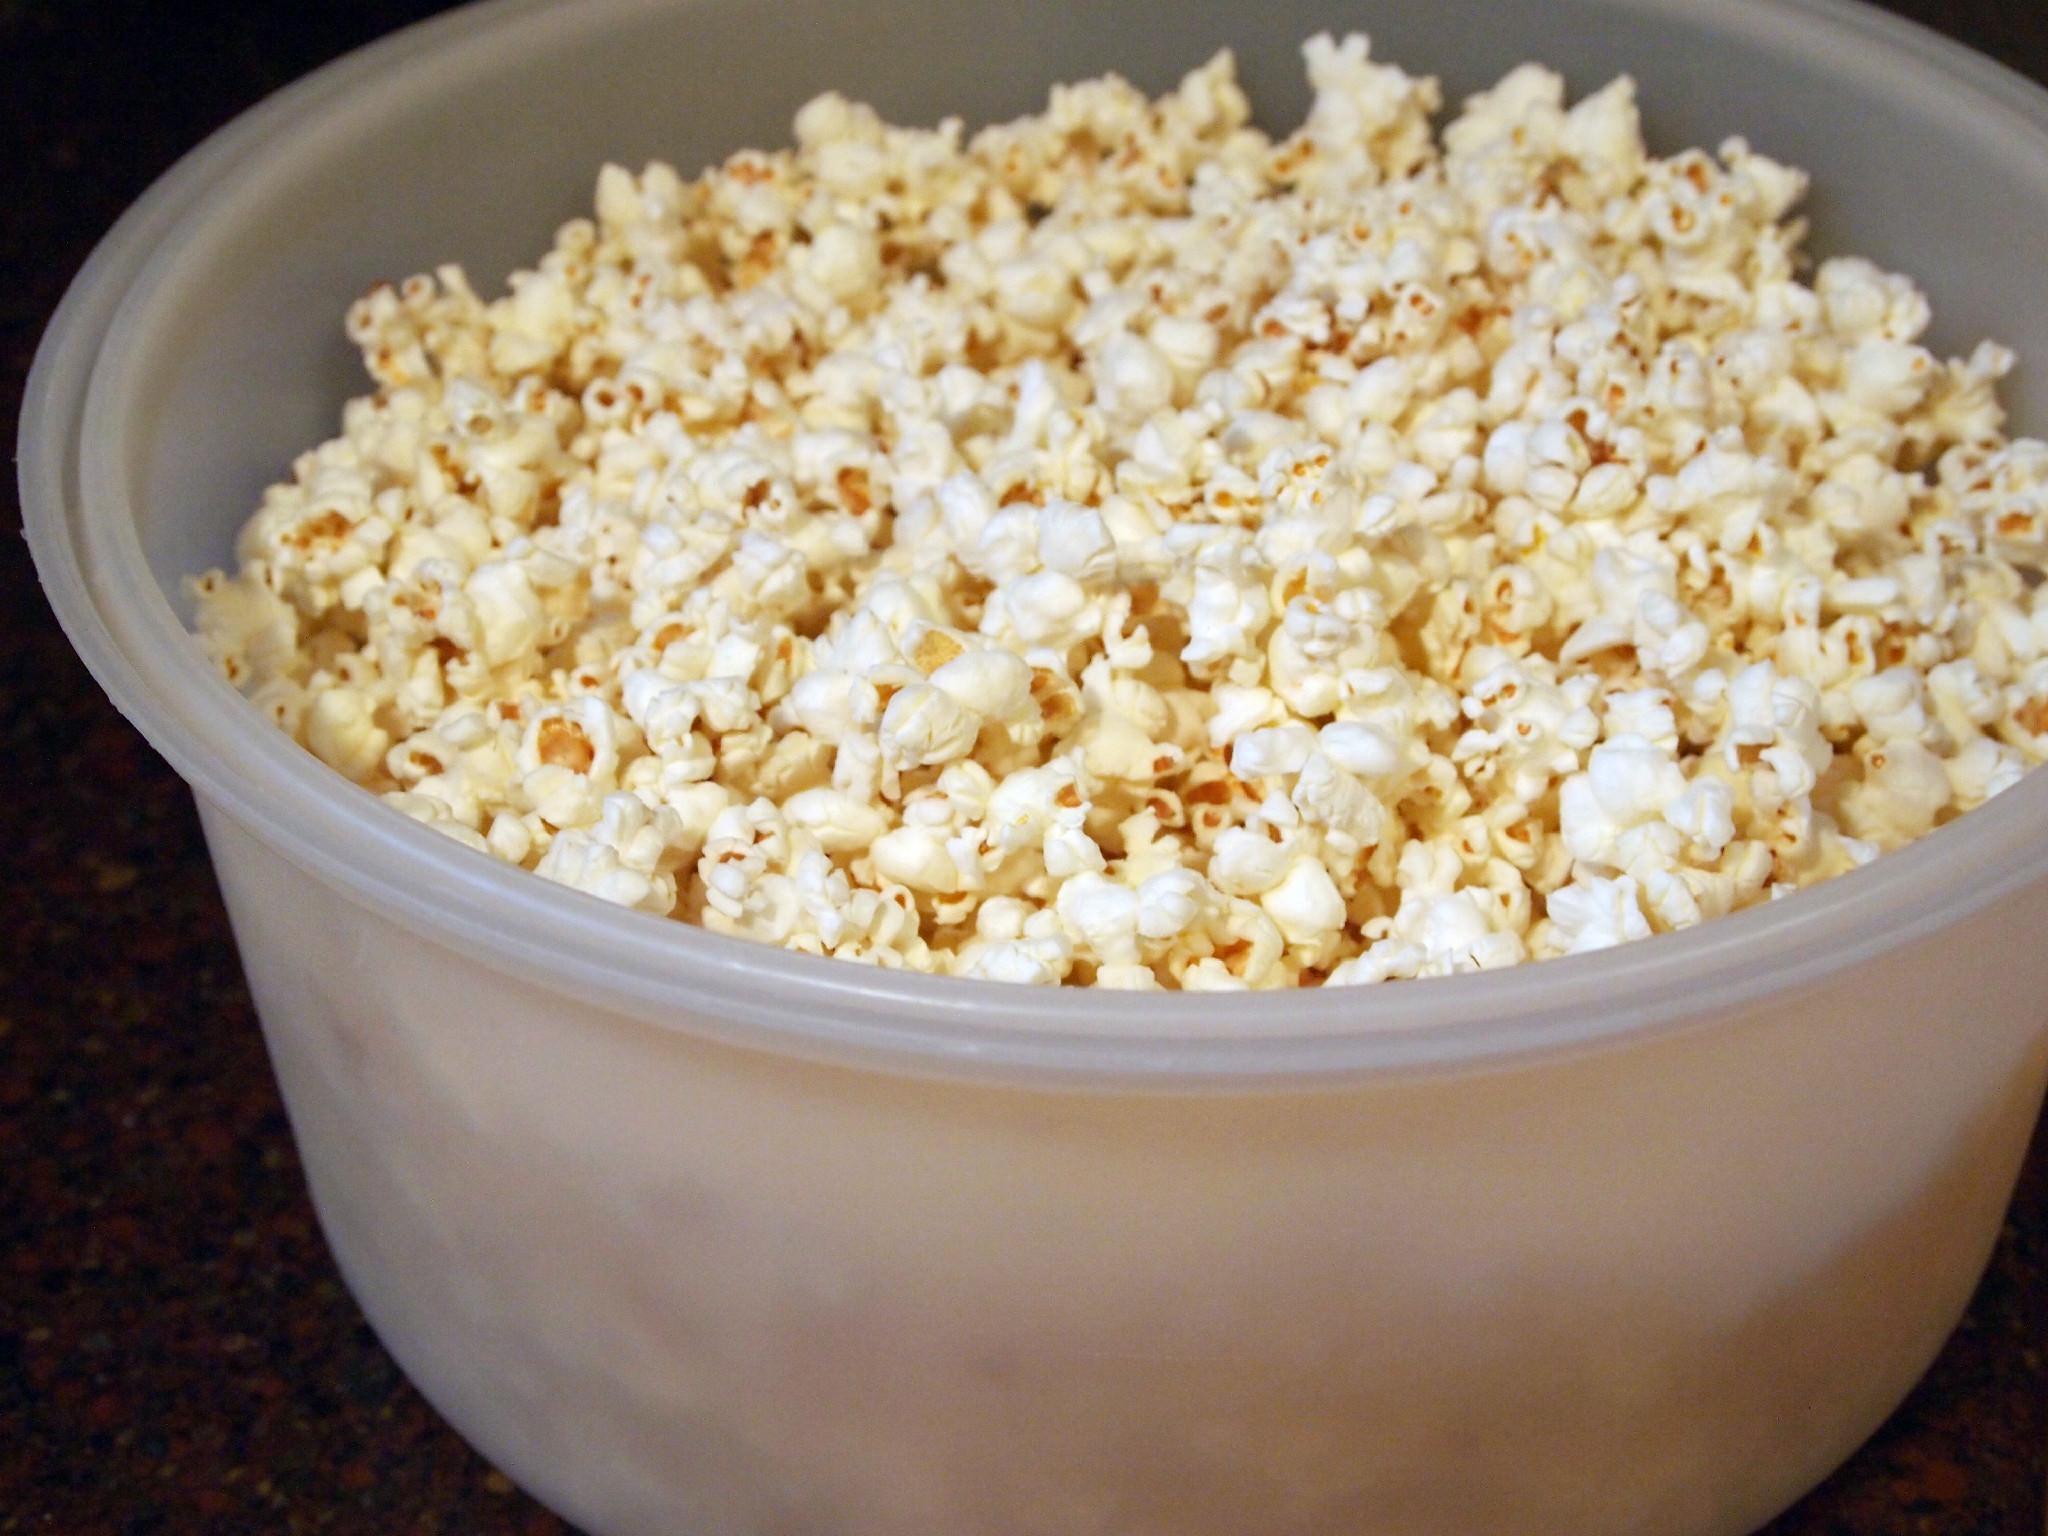 whole lot o' popcorn